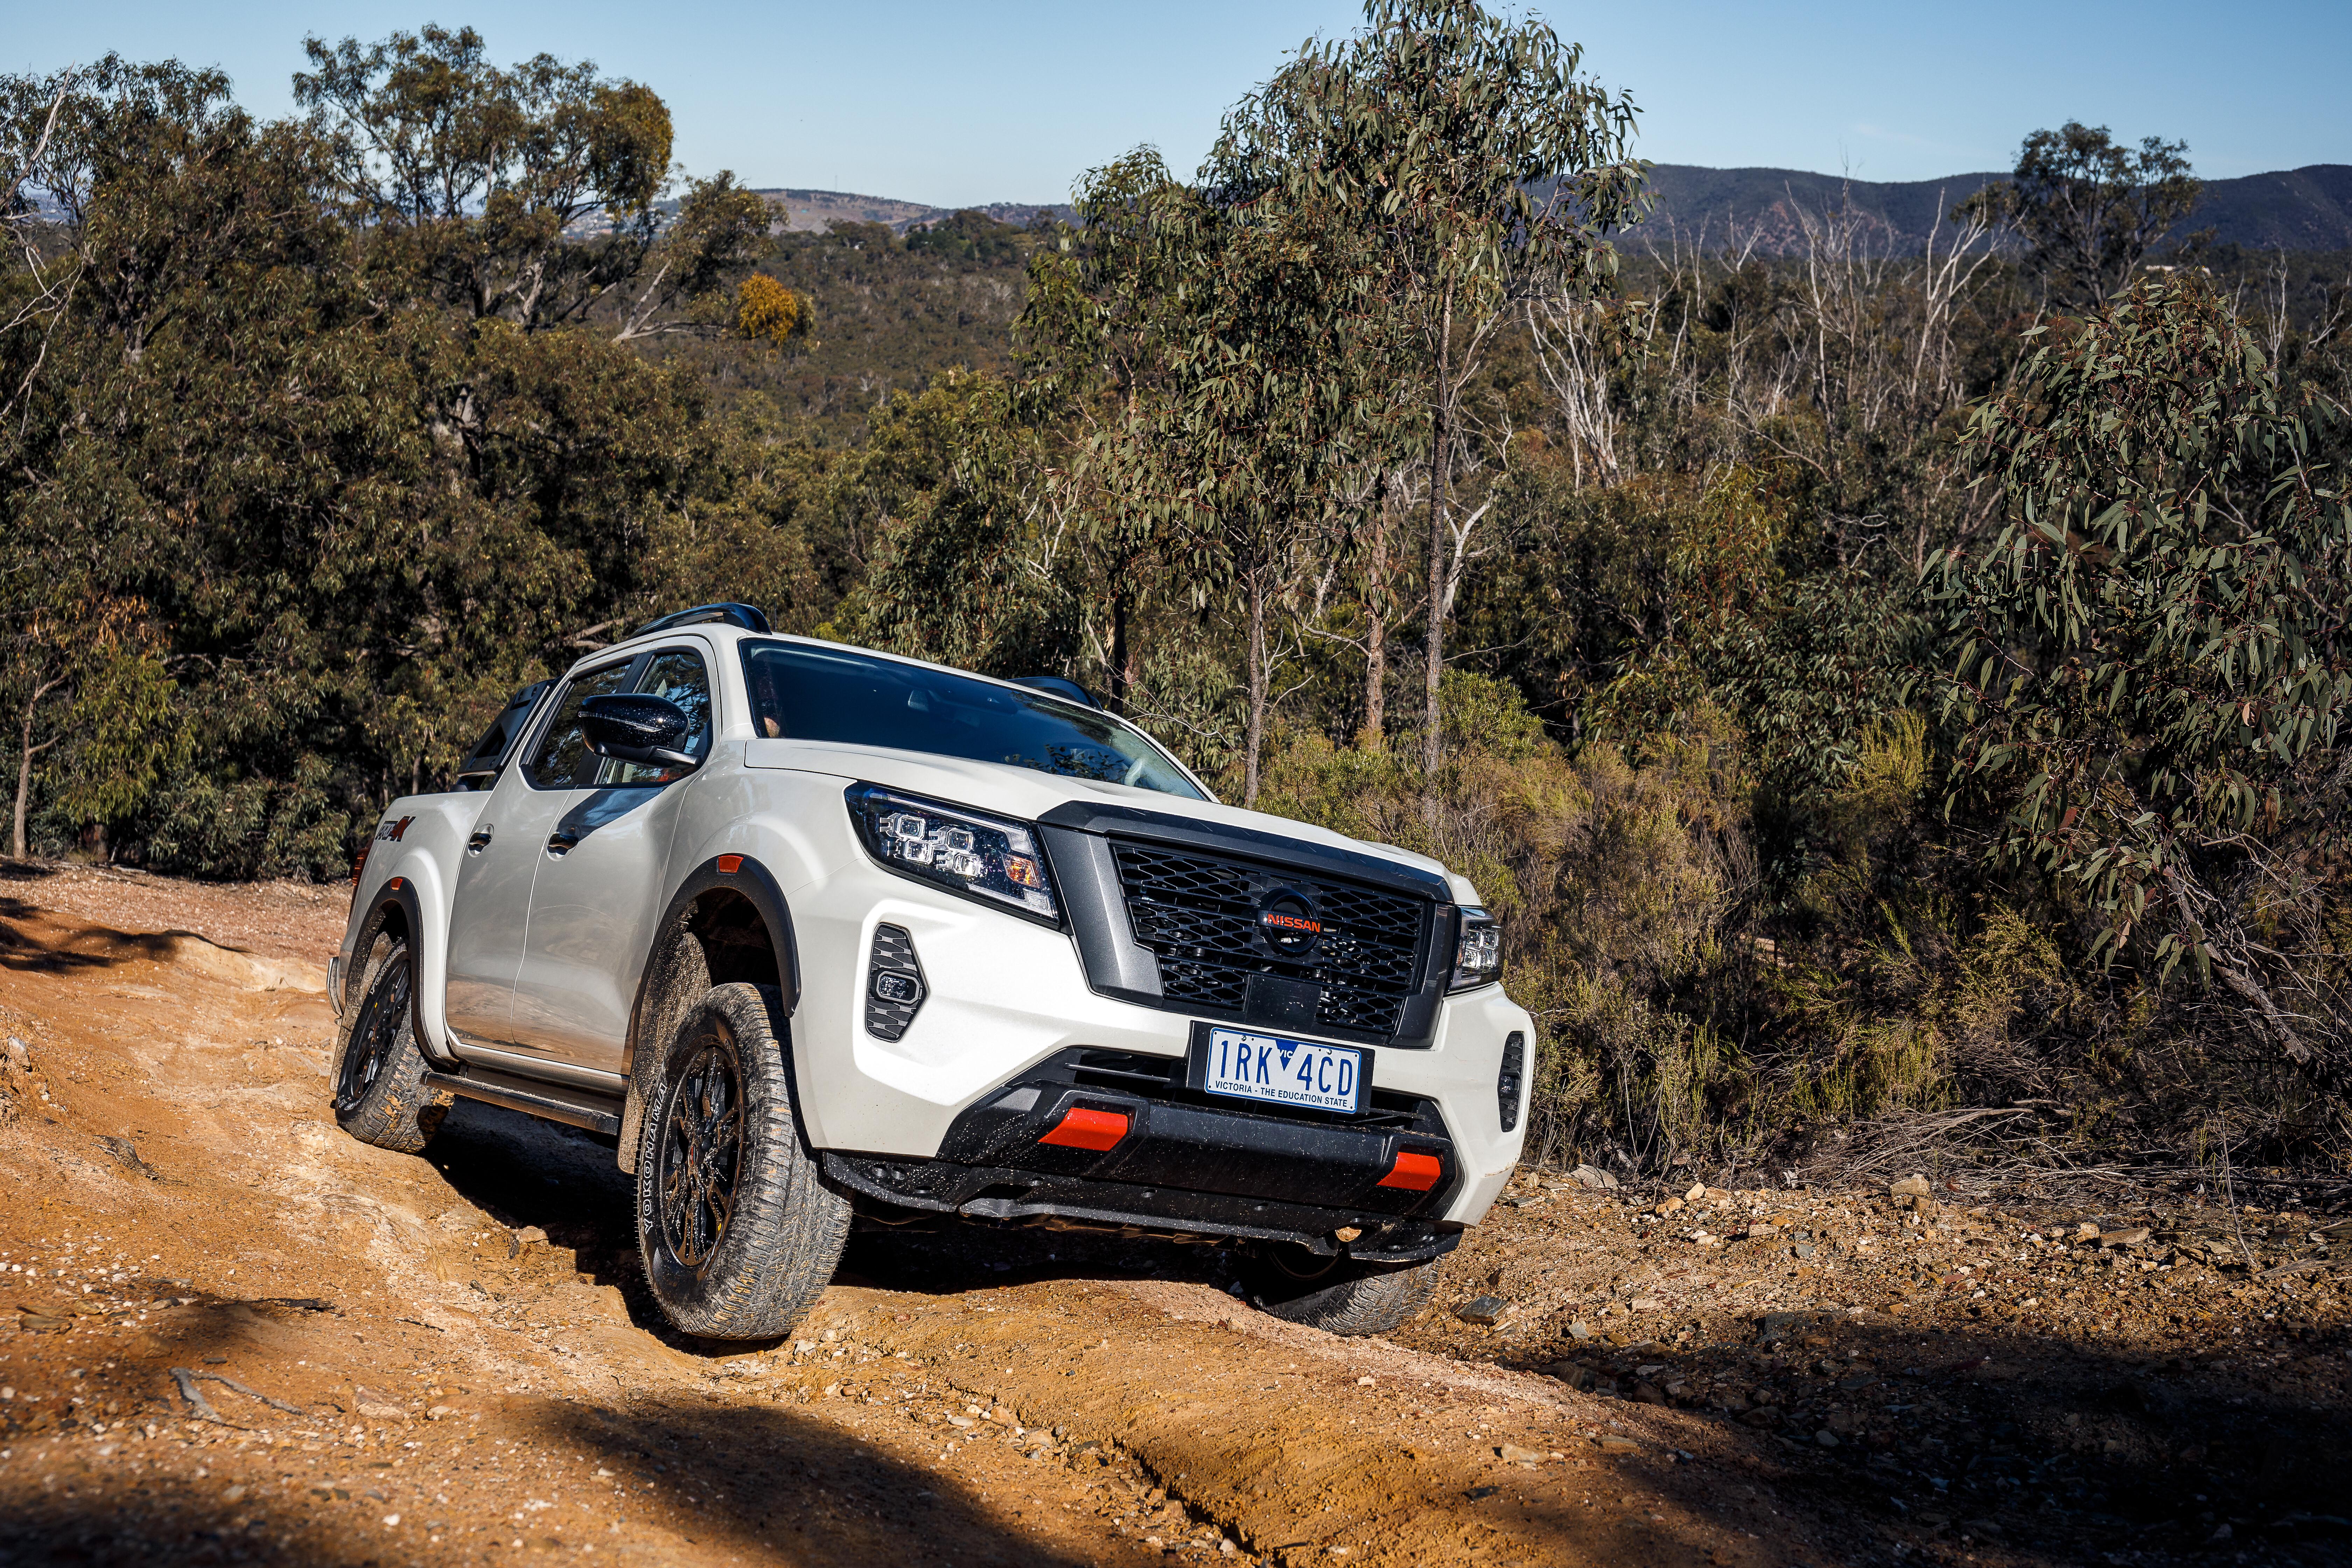 4 X 4 Australia Reviews 2021 May 2021 Nissan Navara PRO 4 X 2